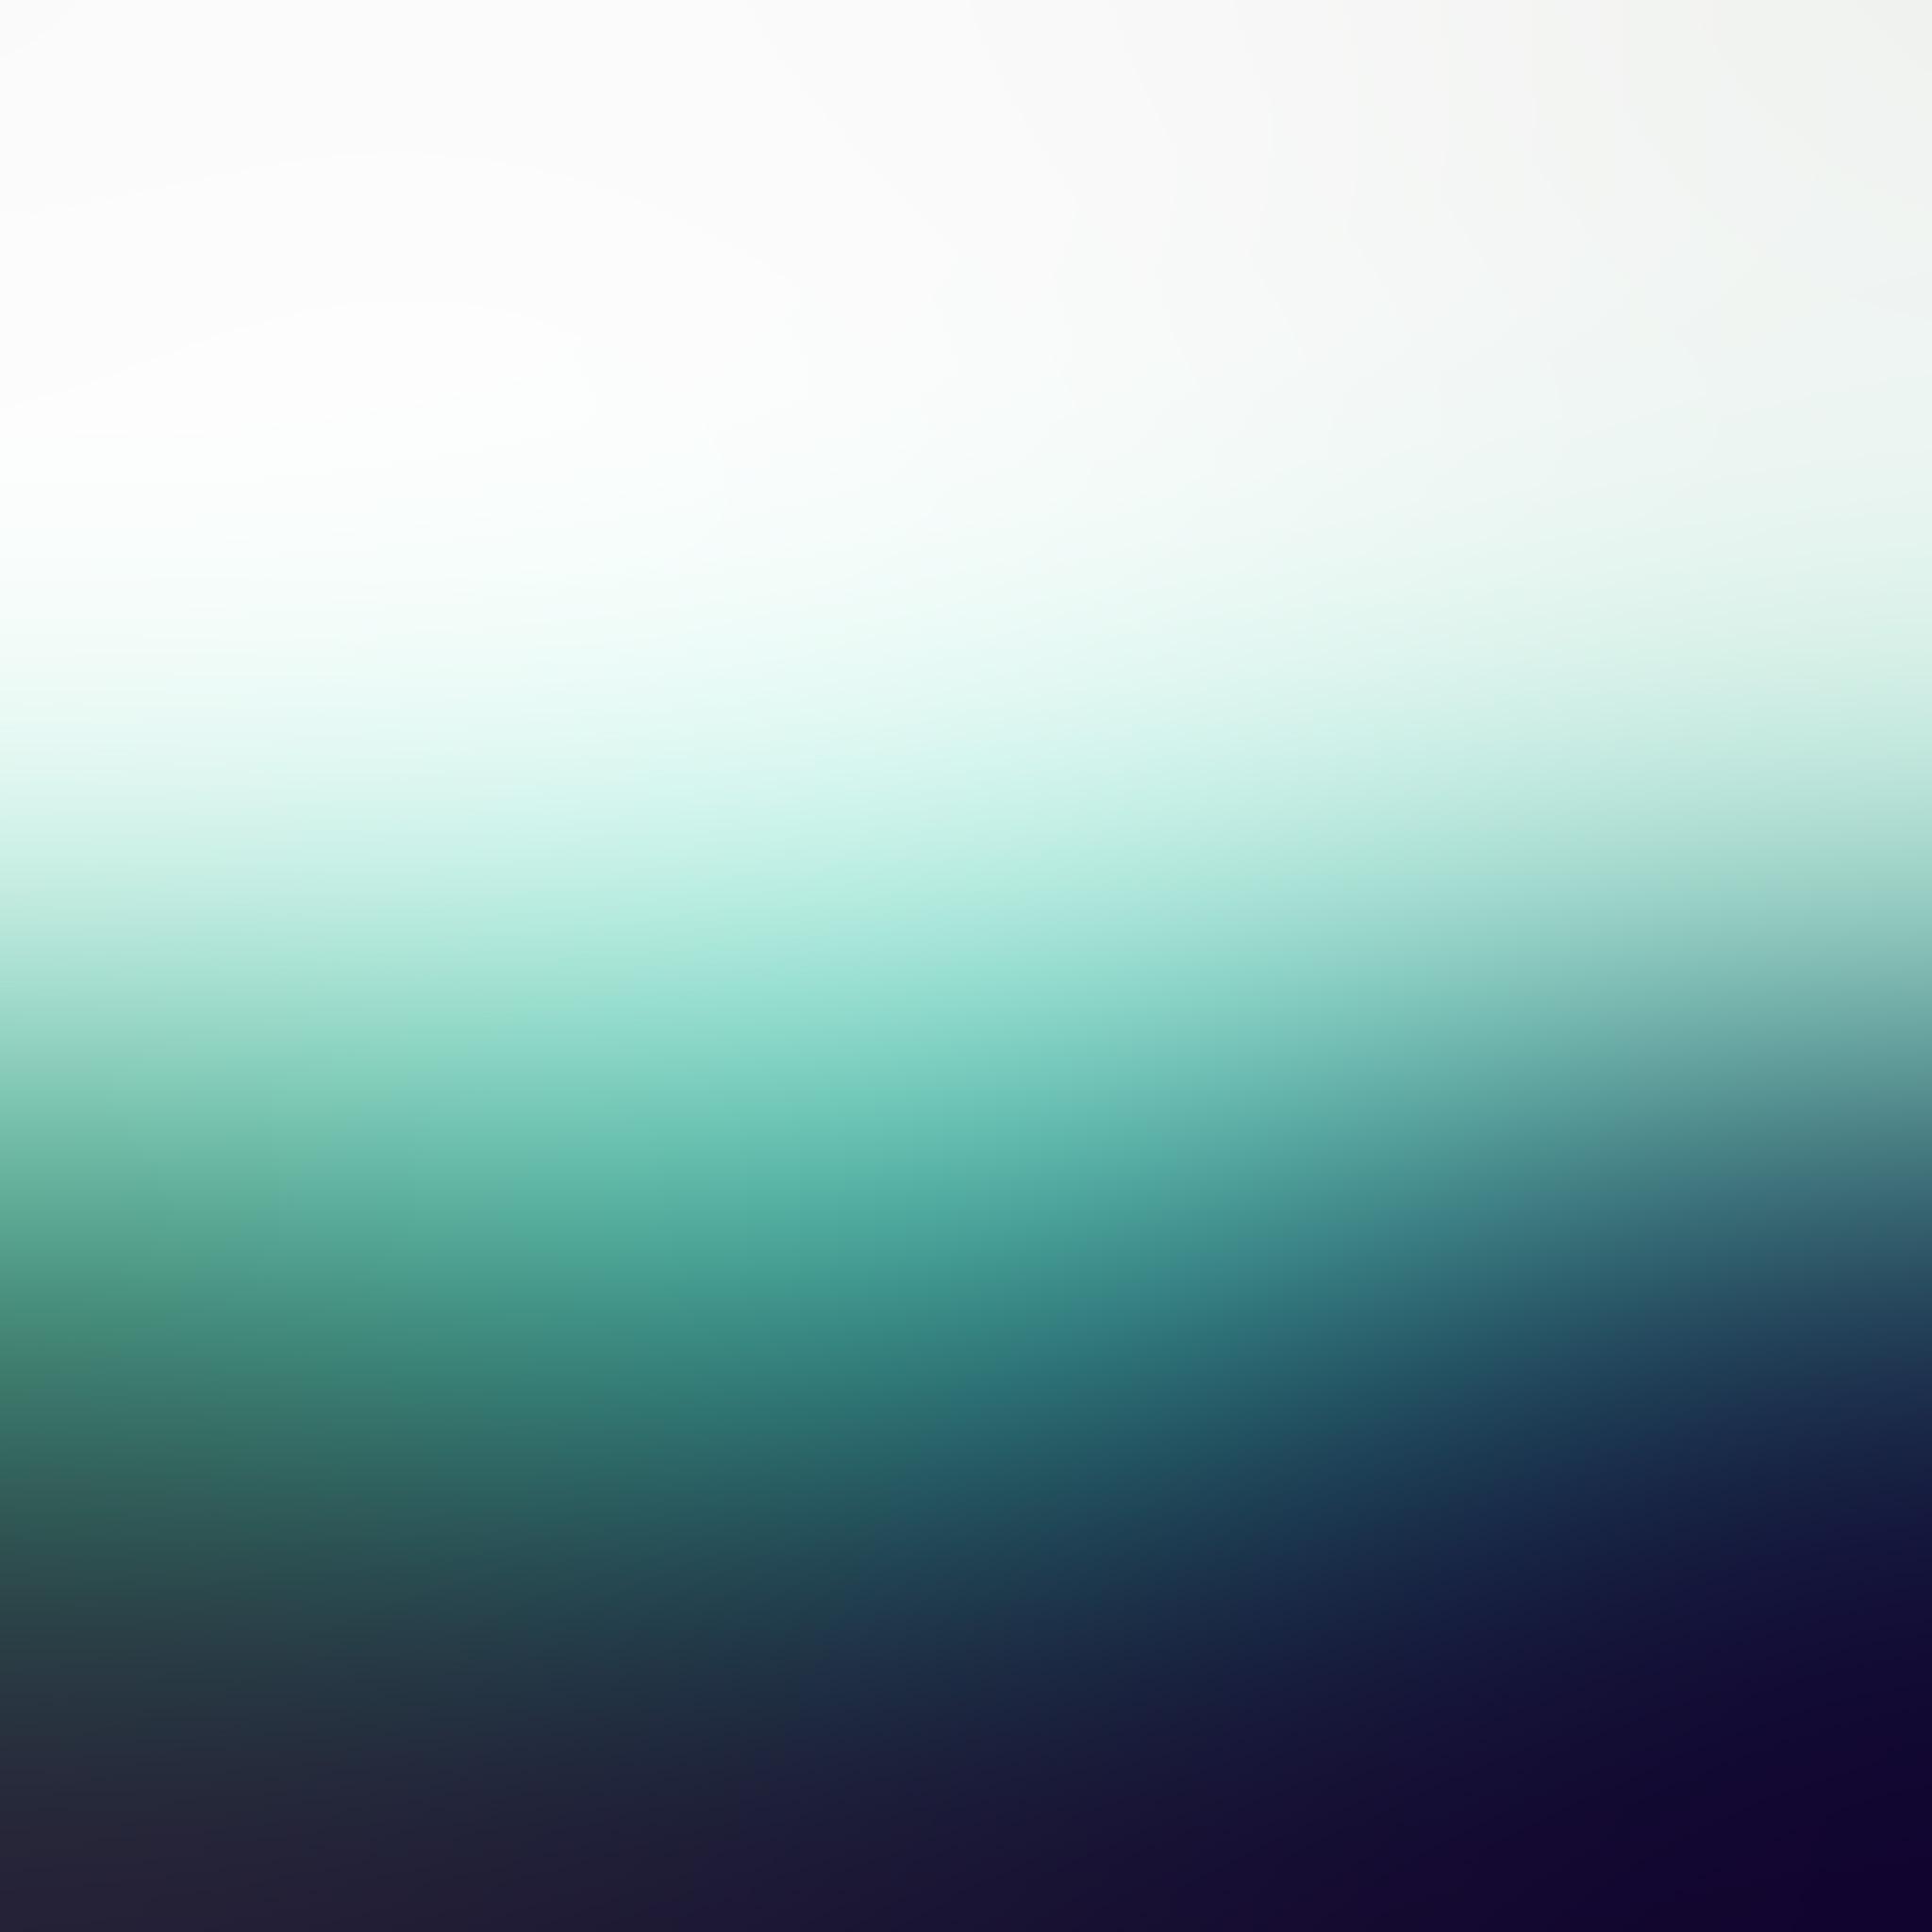 Blue White Living Room: Sj77-blue-white-gradation-blur